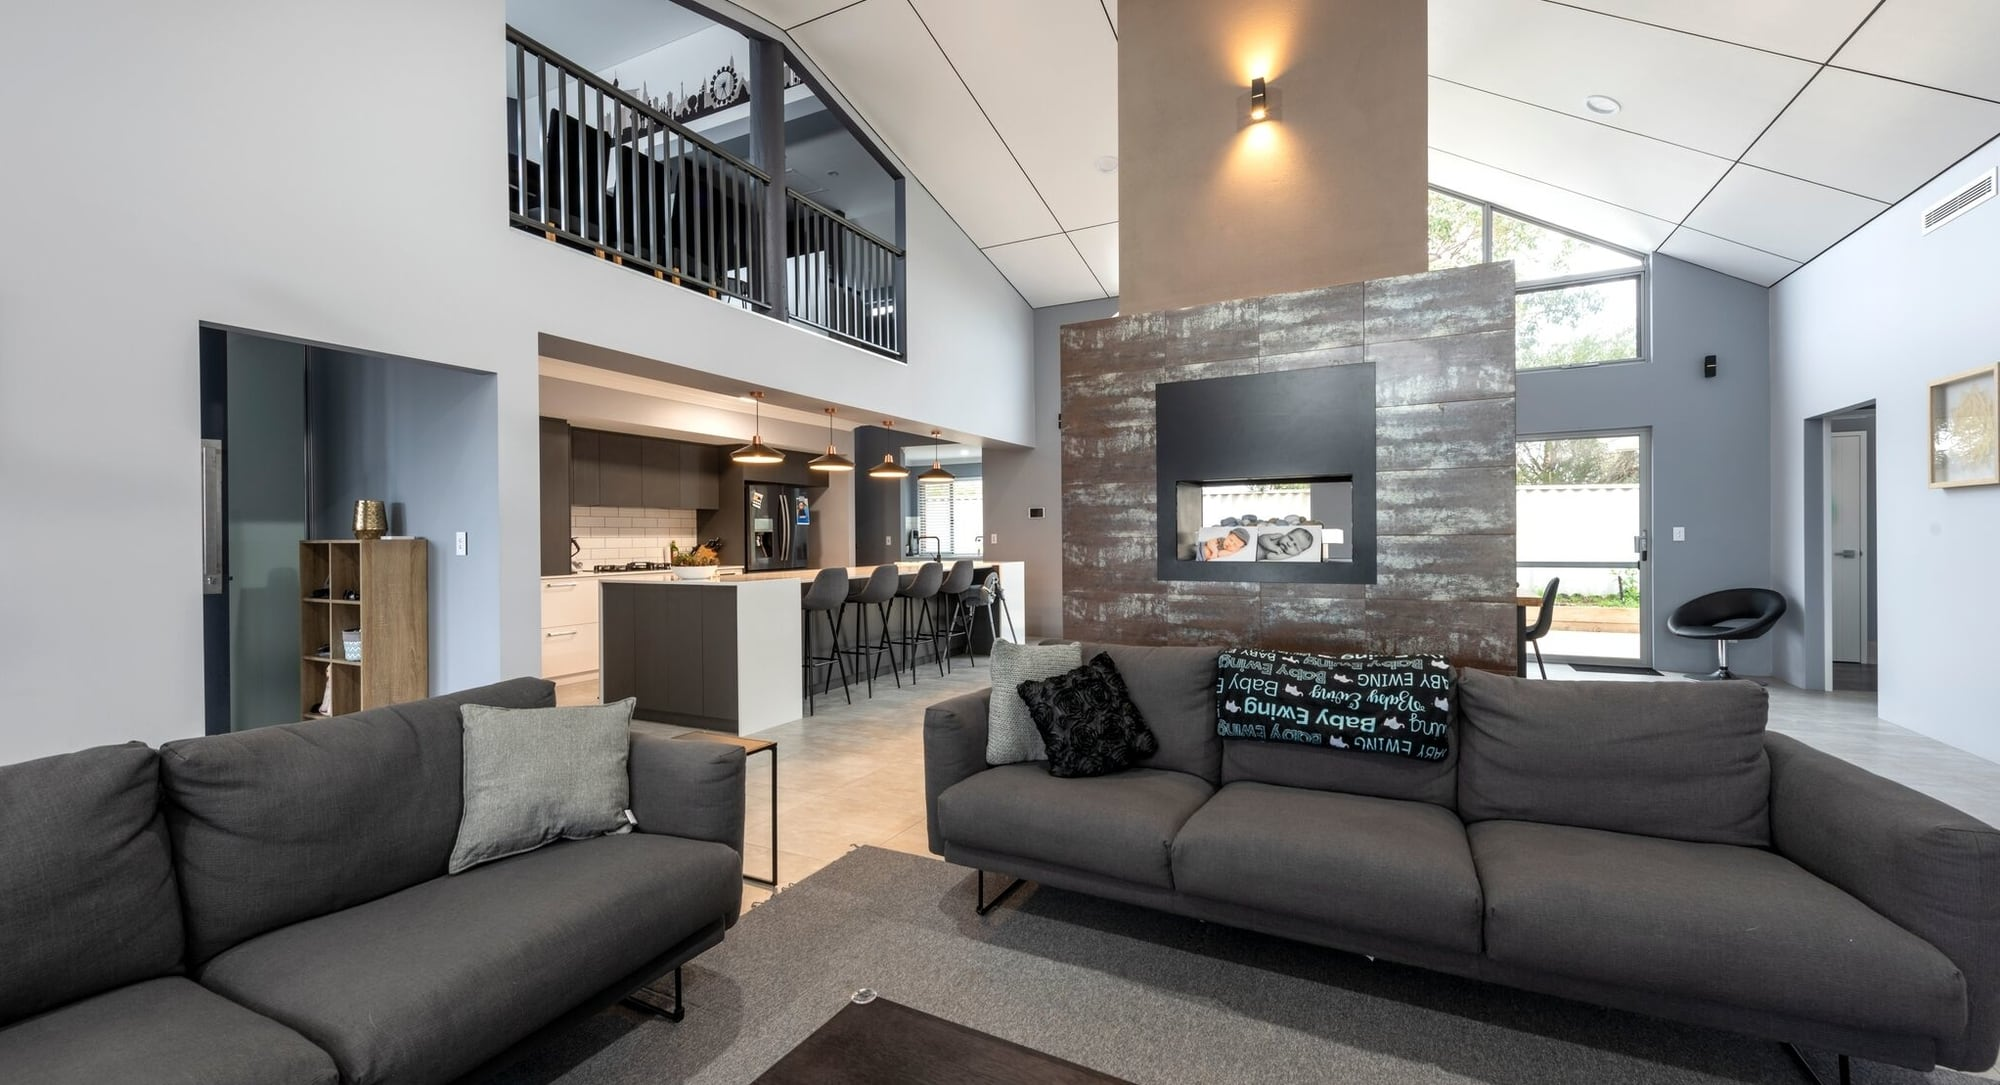 Living Area in a New Home Australind built by Bunbury Builders - Coastline Homes